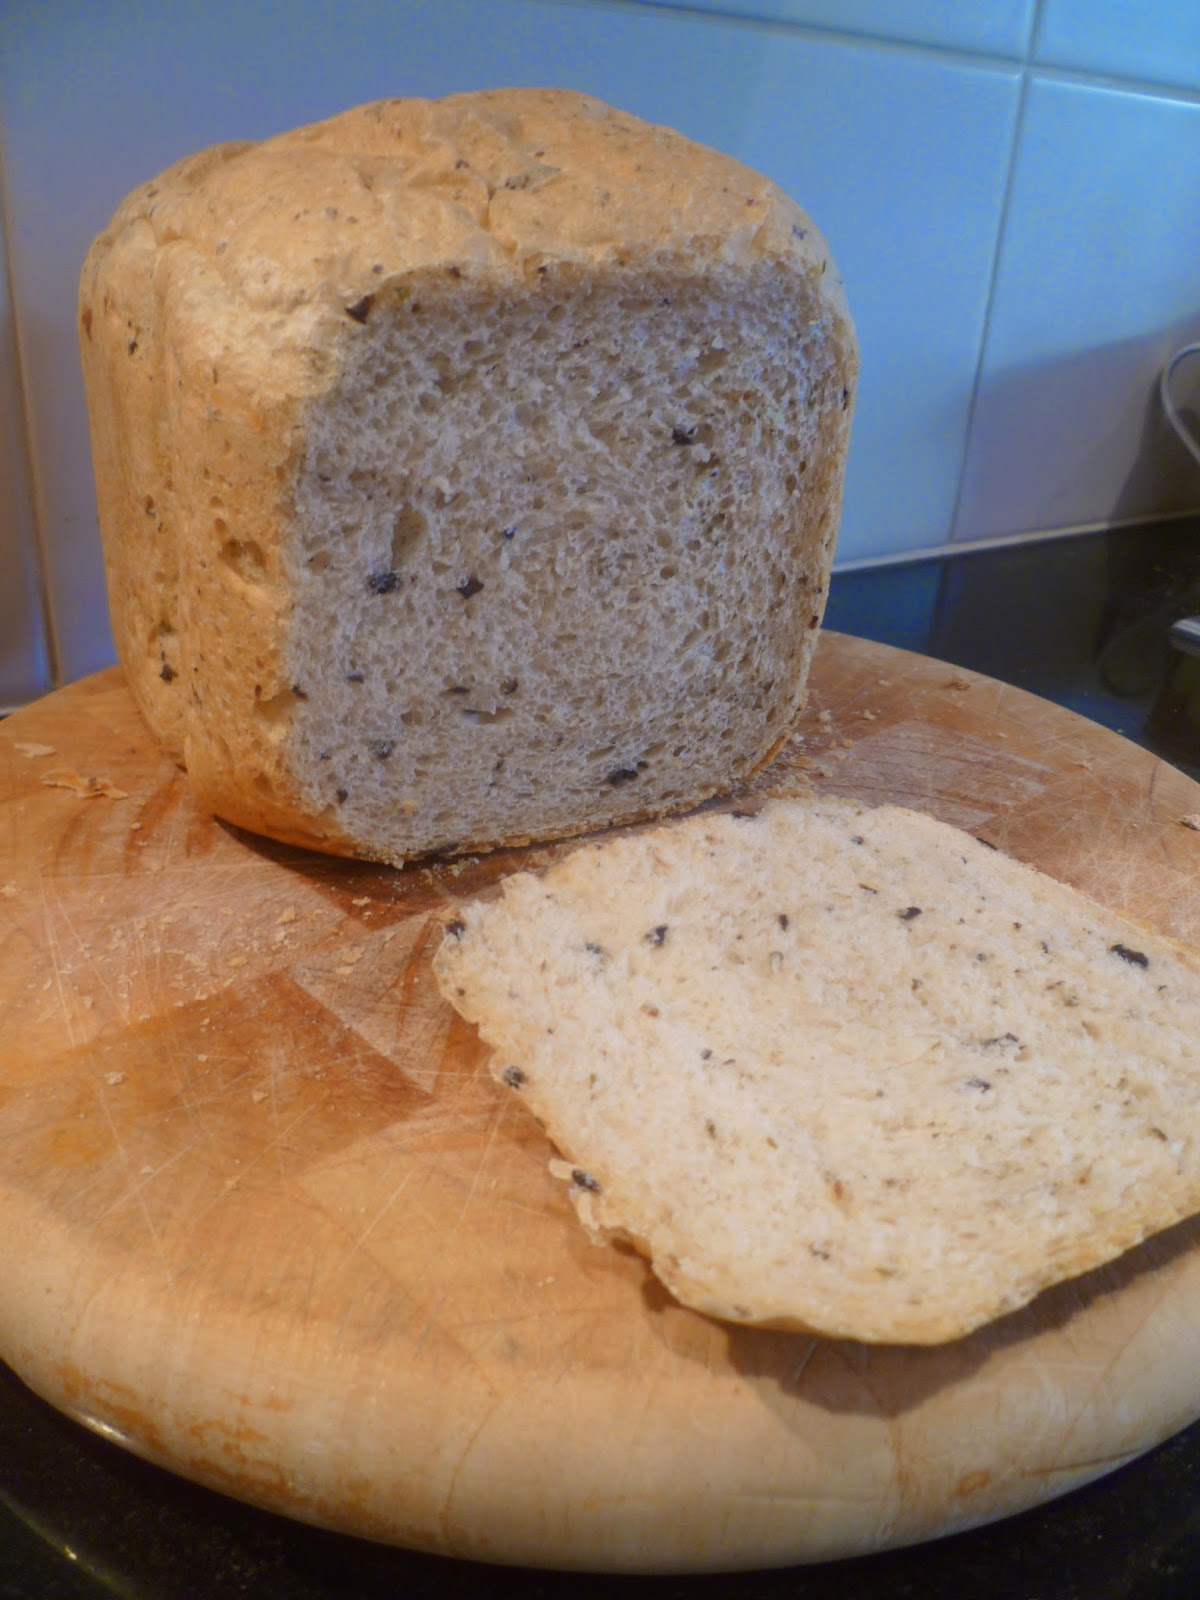 Mummy Baking Oregano And Black Olive Bread Panasonic Breadmaker